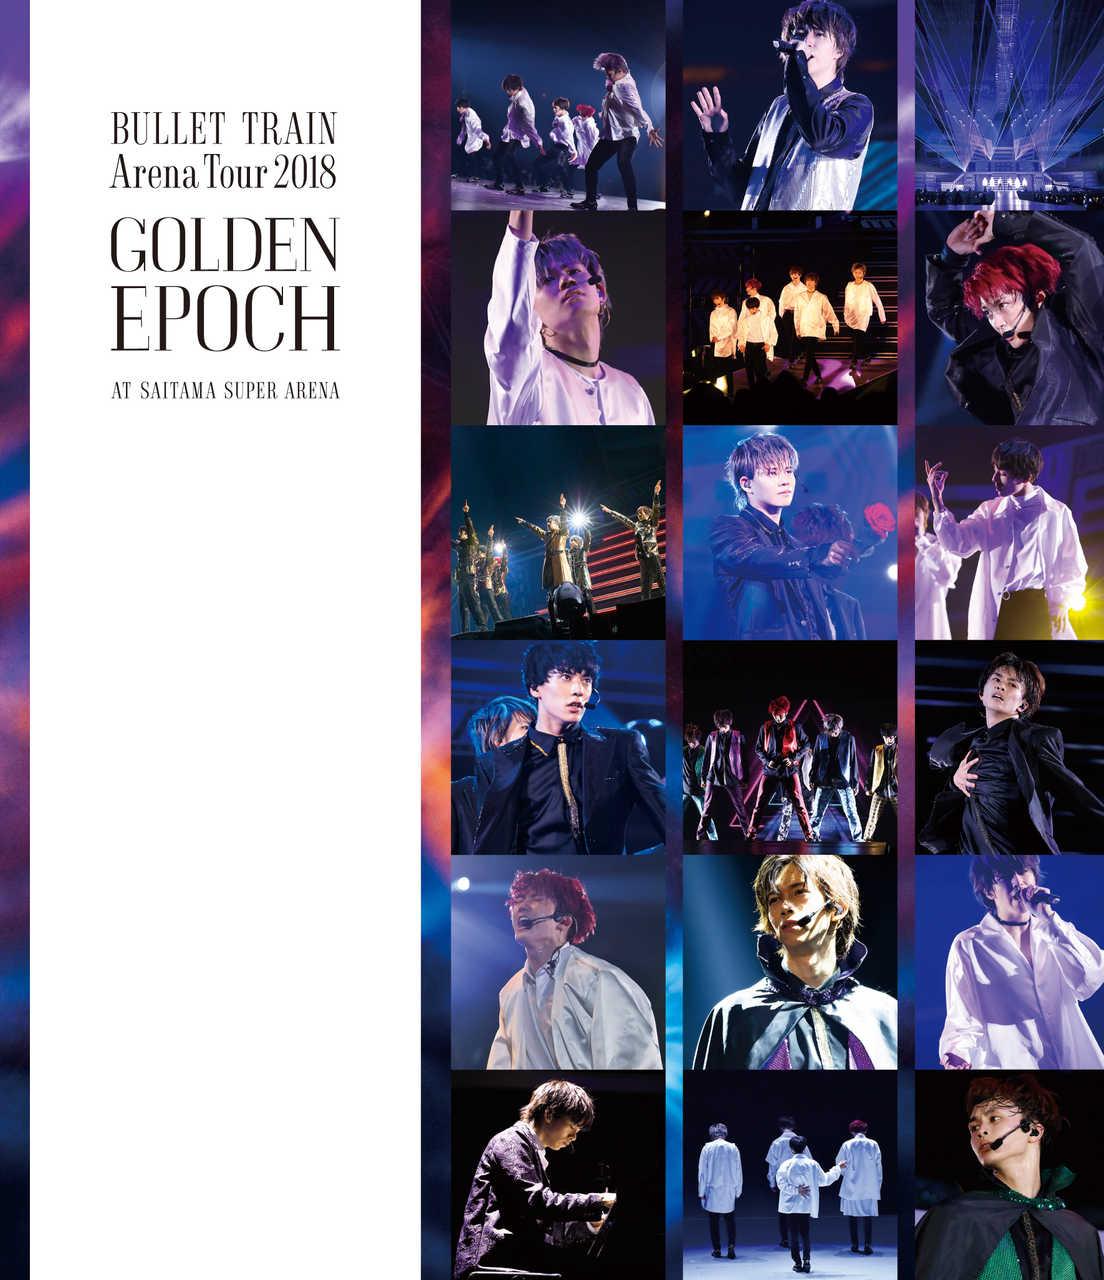 Blu-ray『BULLET TRAIN Arena Tour 2018 GOLDEN EPOCH AT SAITAMA SUPER ARENA 』【通常盤】